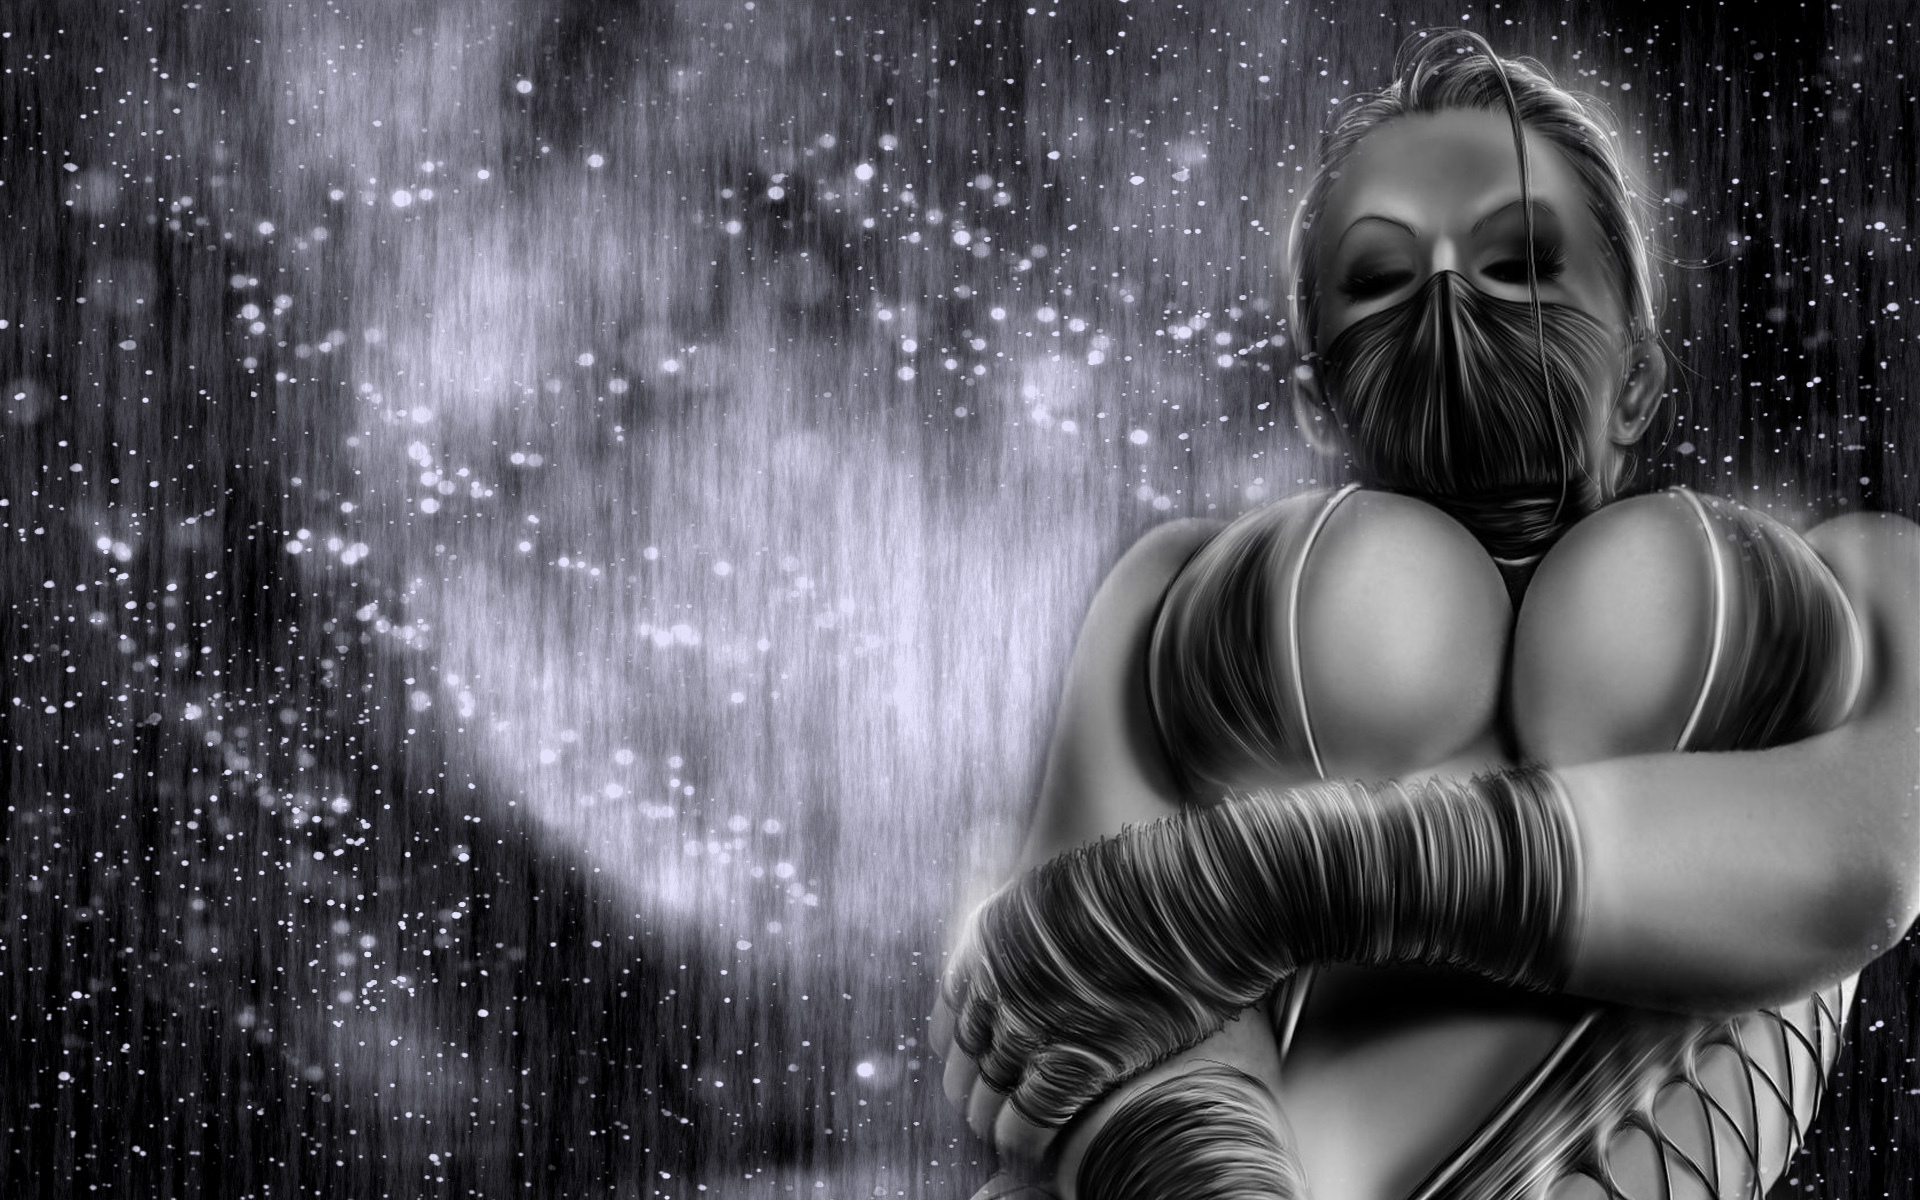 Mortal Kombat Wallpaper Kitana To Fight Games Fan Site